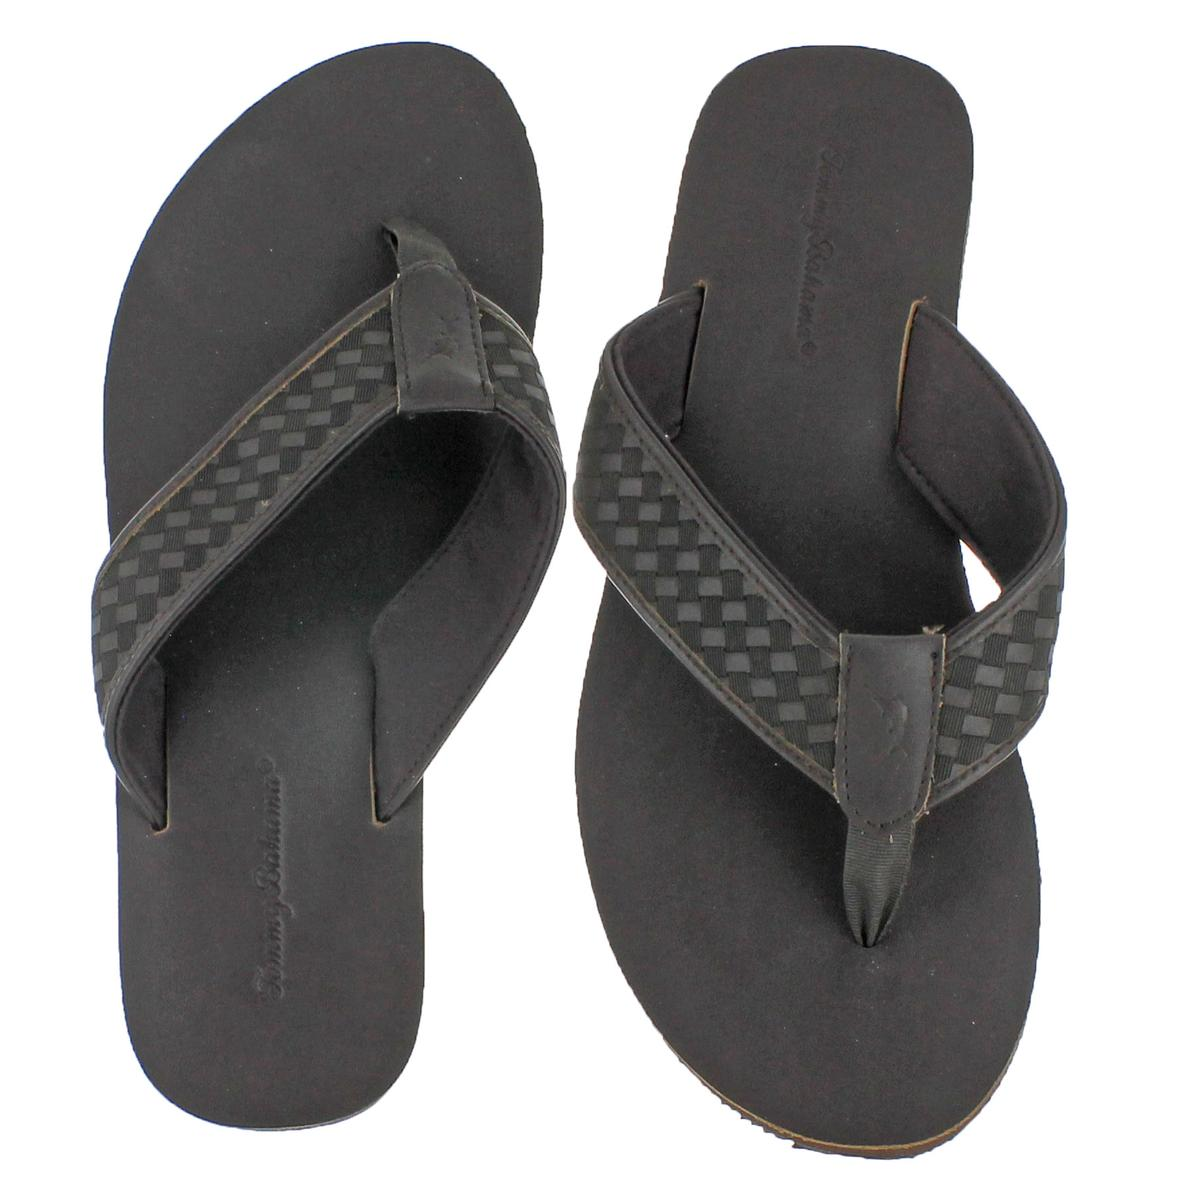 3529bd0770bc81 Tommy Bahama Waldon Men s Woven Leather Flip Flop Sandals